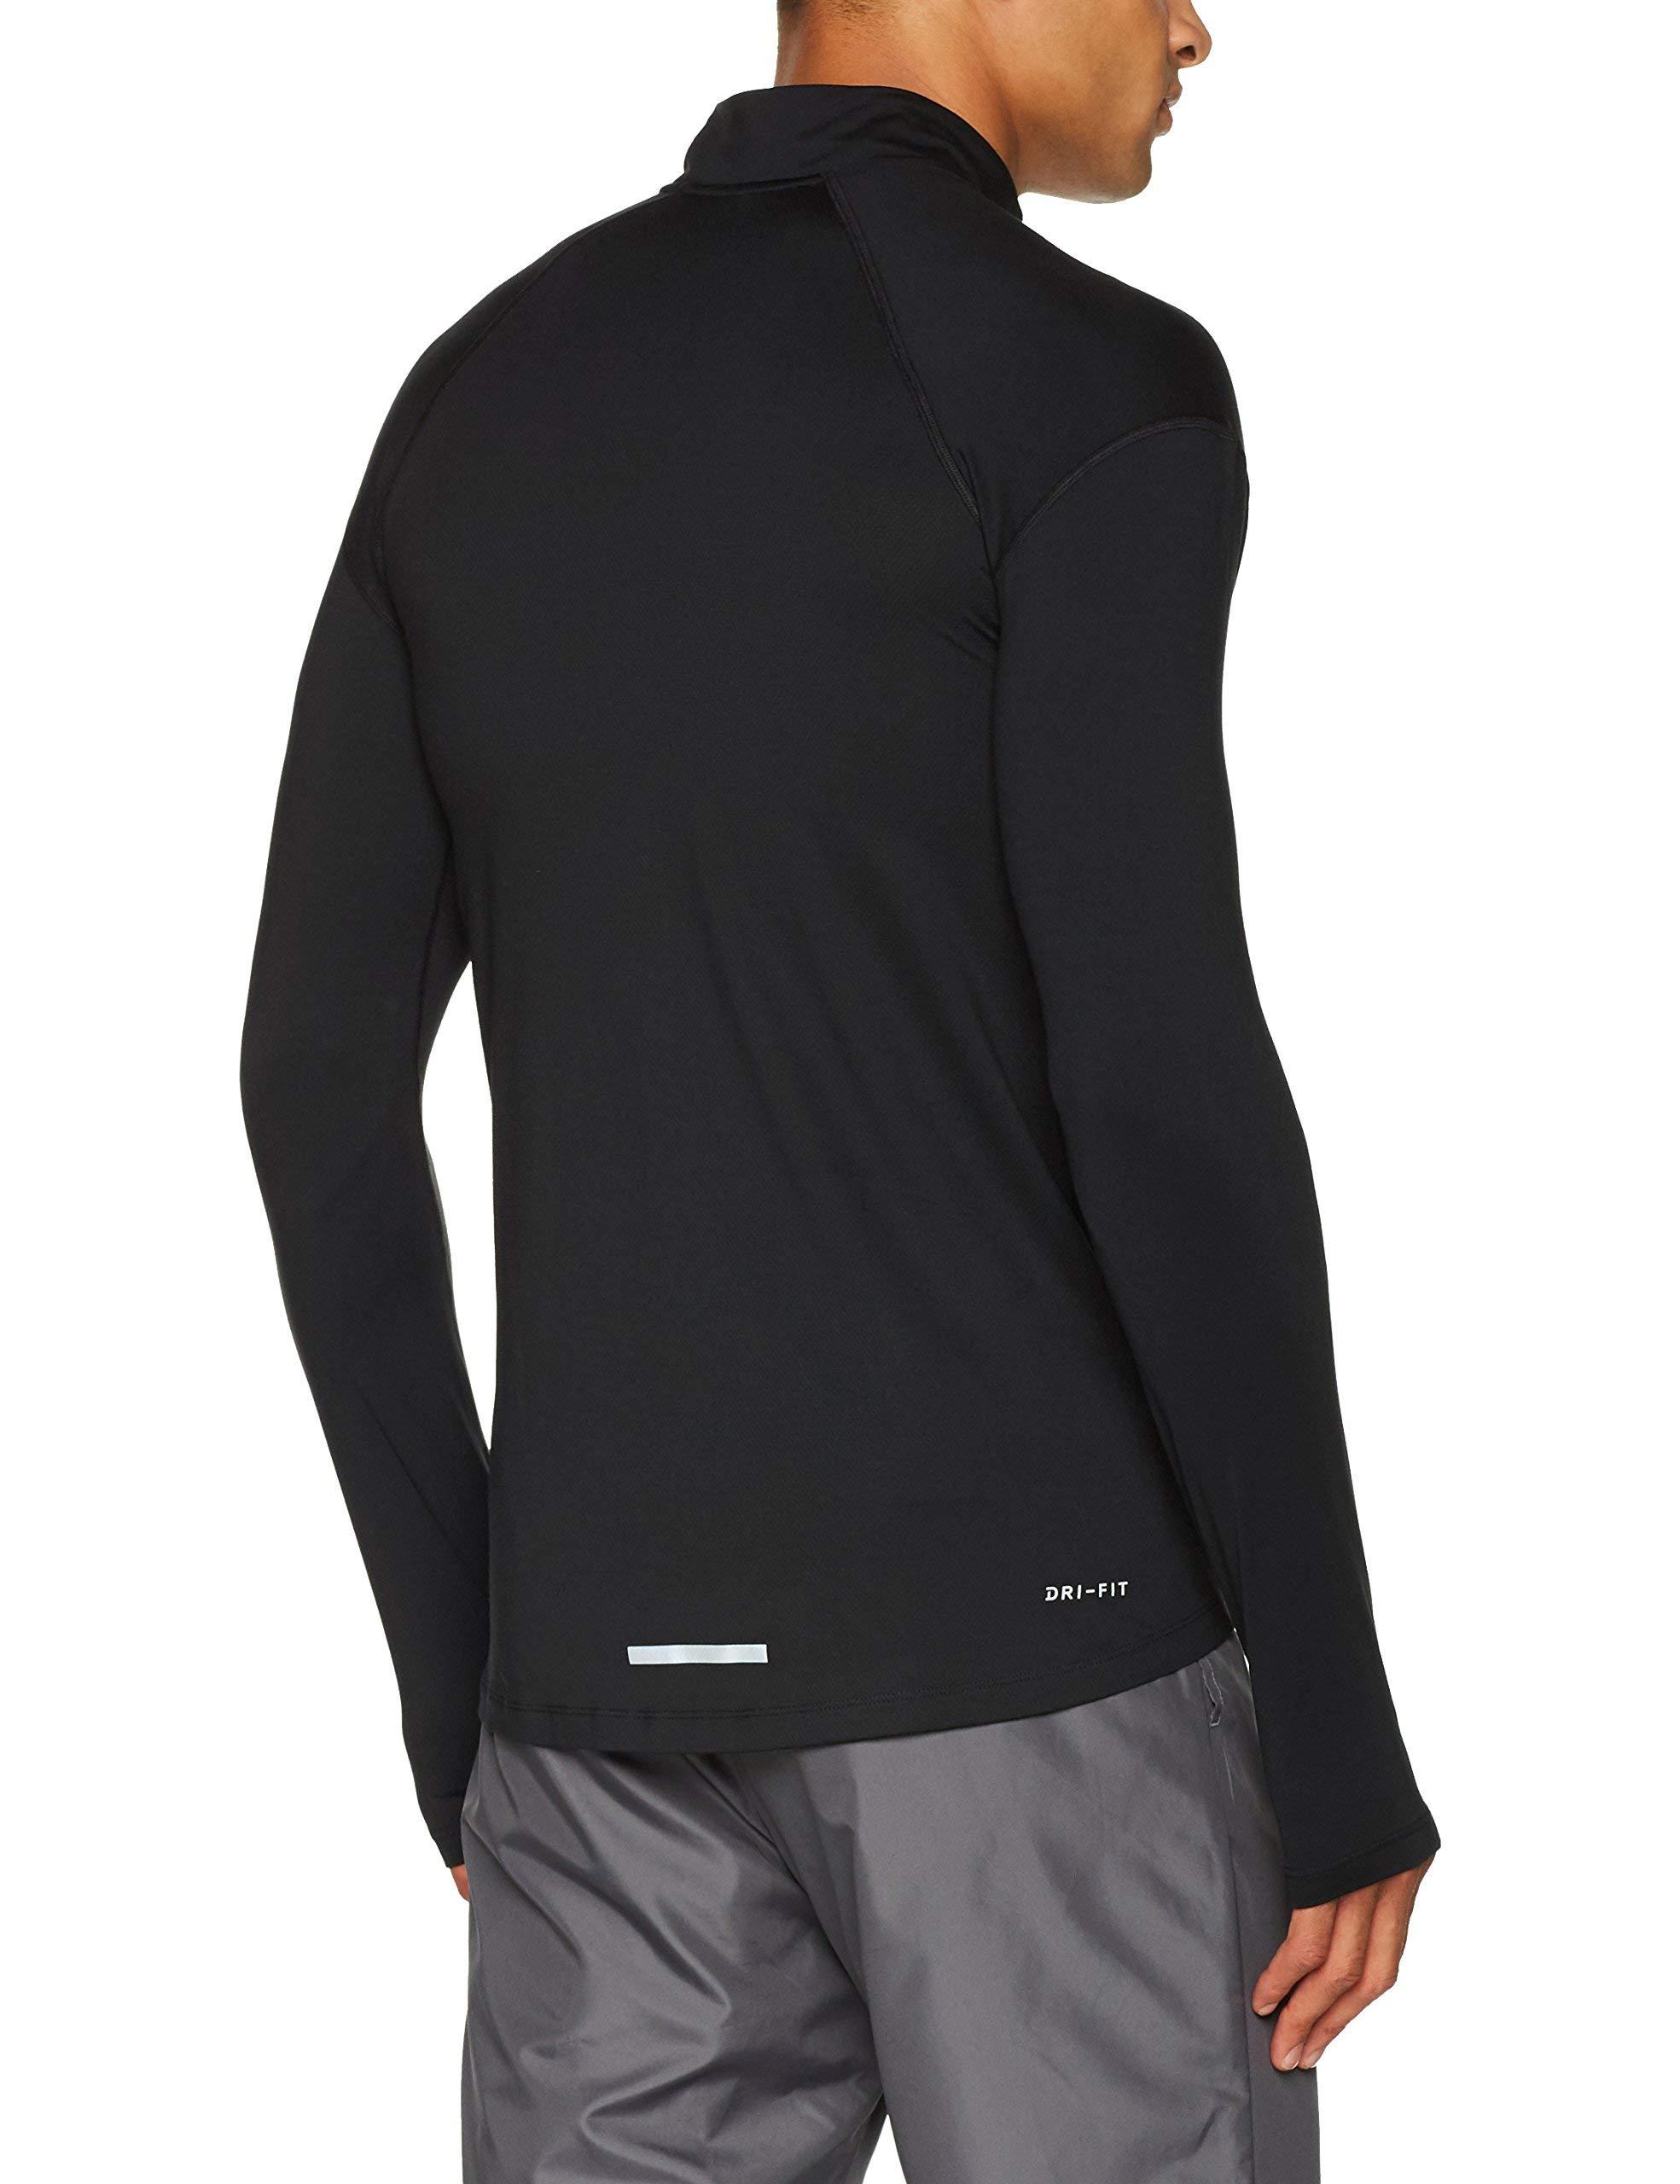 Nike Men's Dry Element 1/2 Zip Running Top Black Medium by Nike (Image #3)